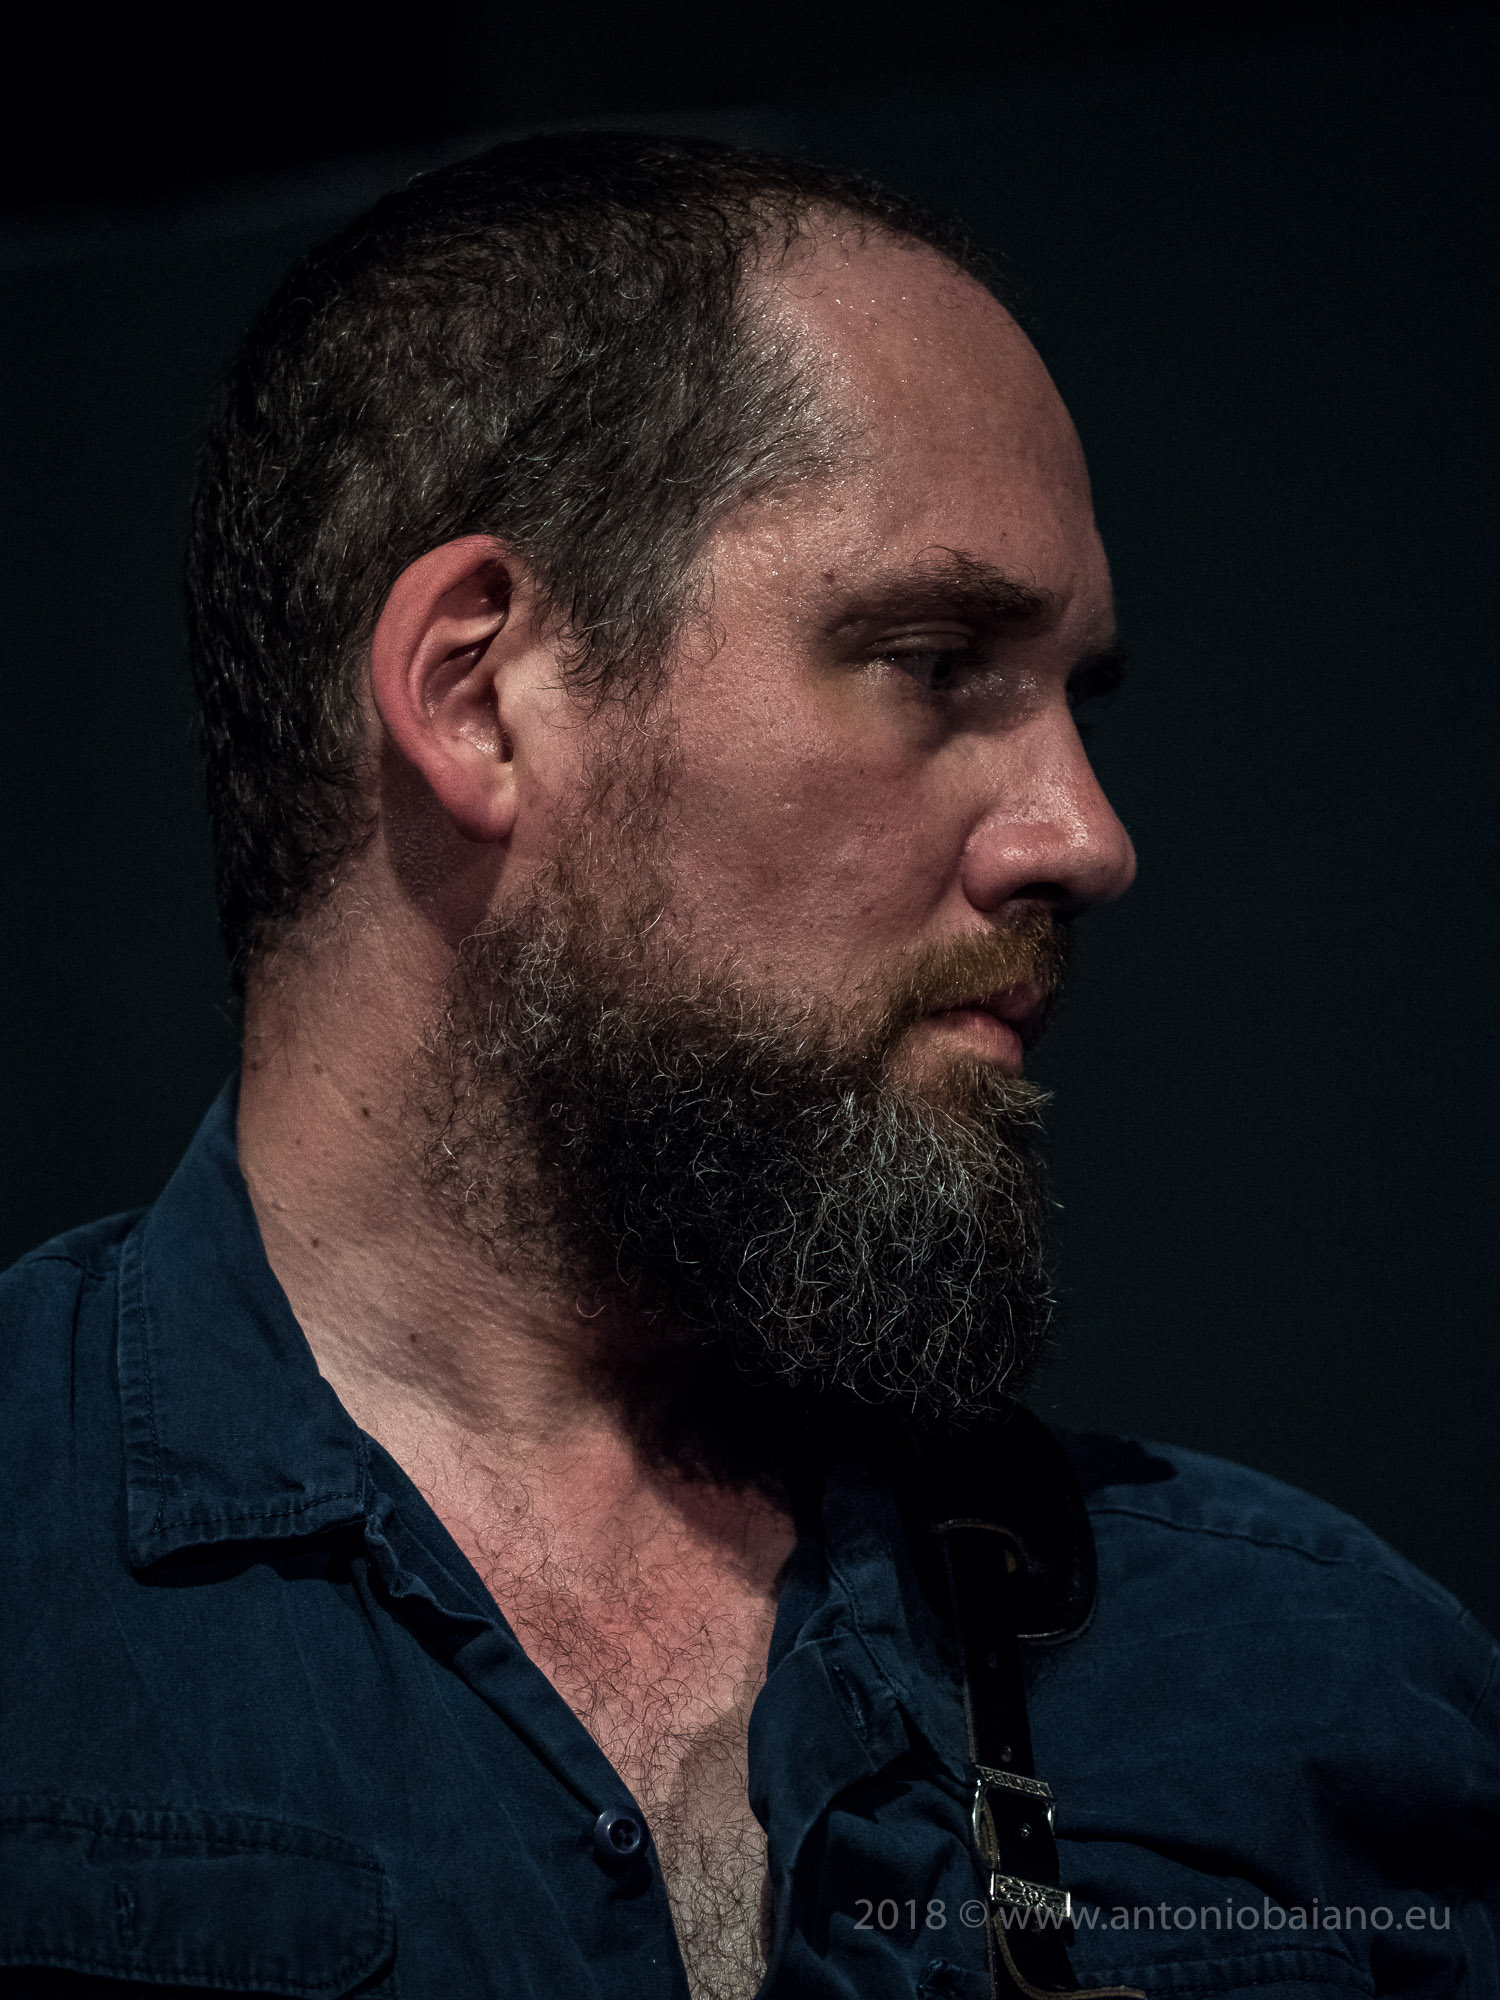 Martin Siewert, Radian - TJF 2018